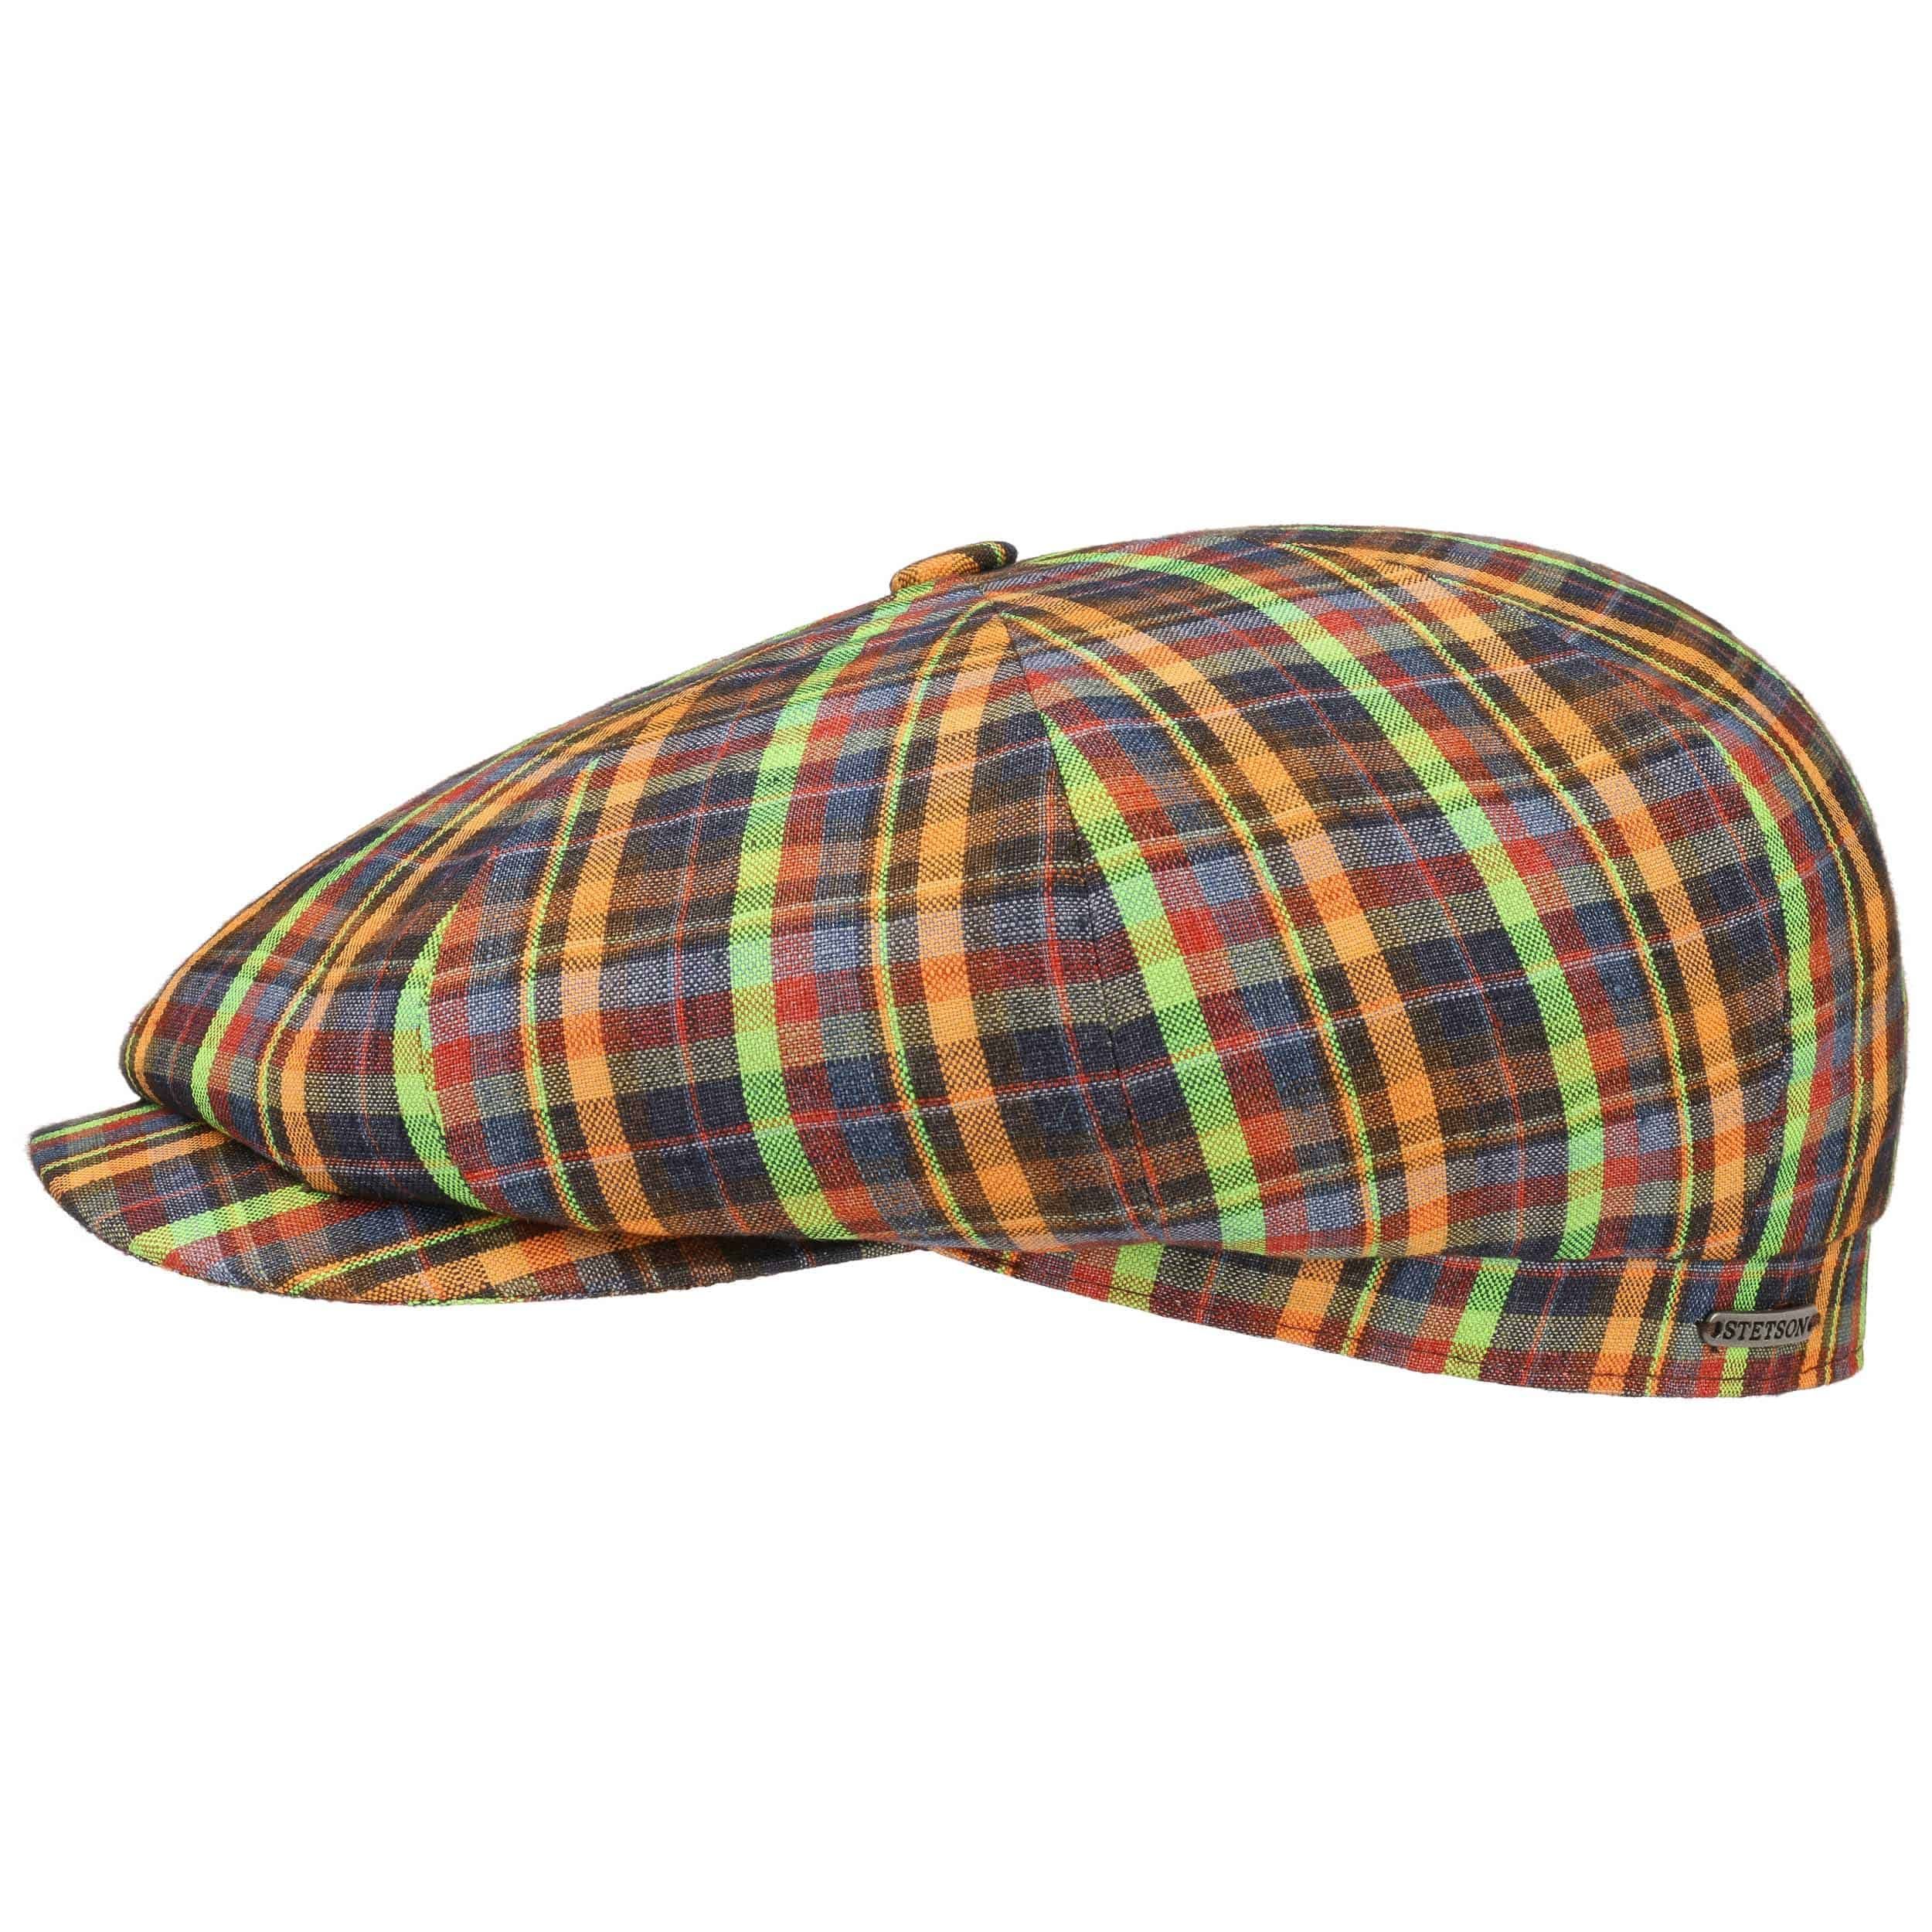 Hatteras Summercheck Flat Cap mixed colours